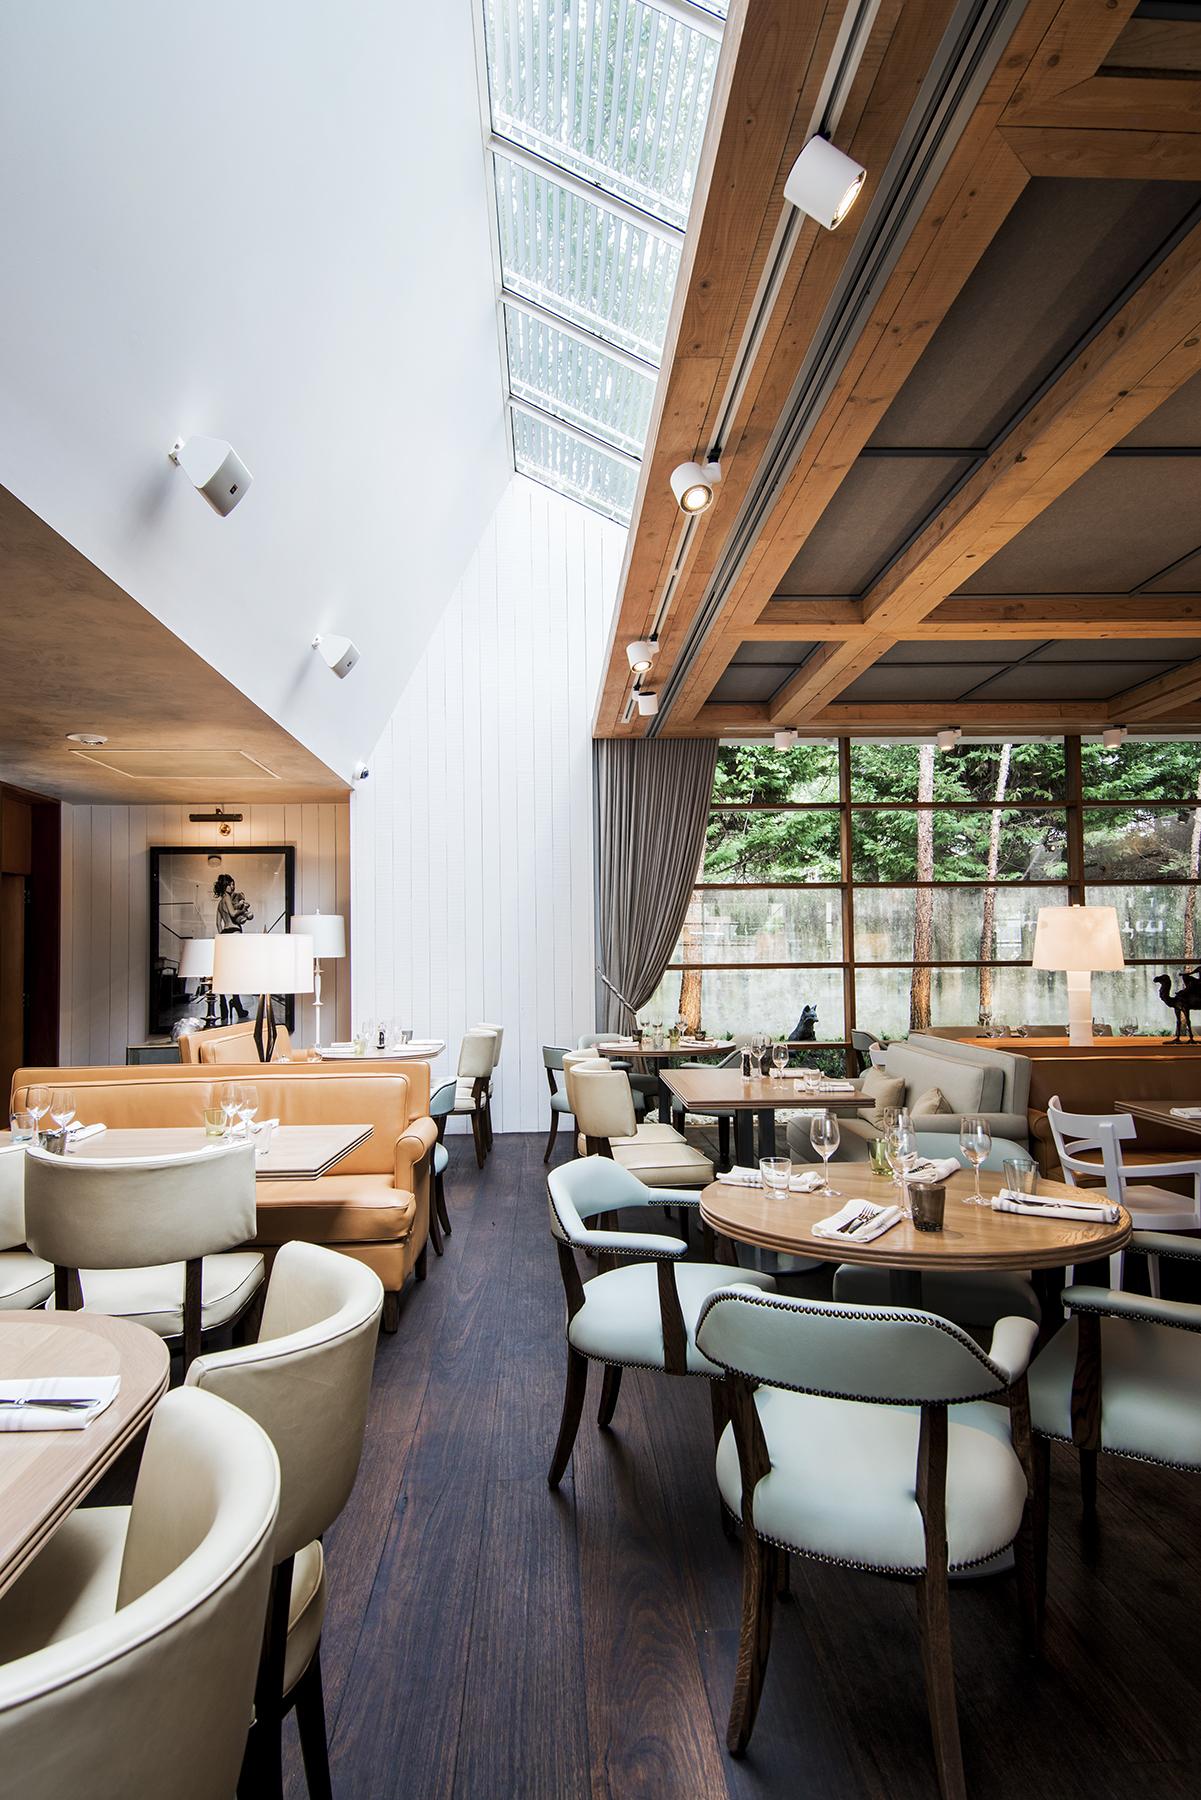 The hotel centennial sydney s hottest new restaurant